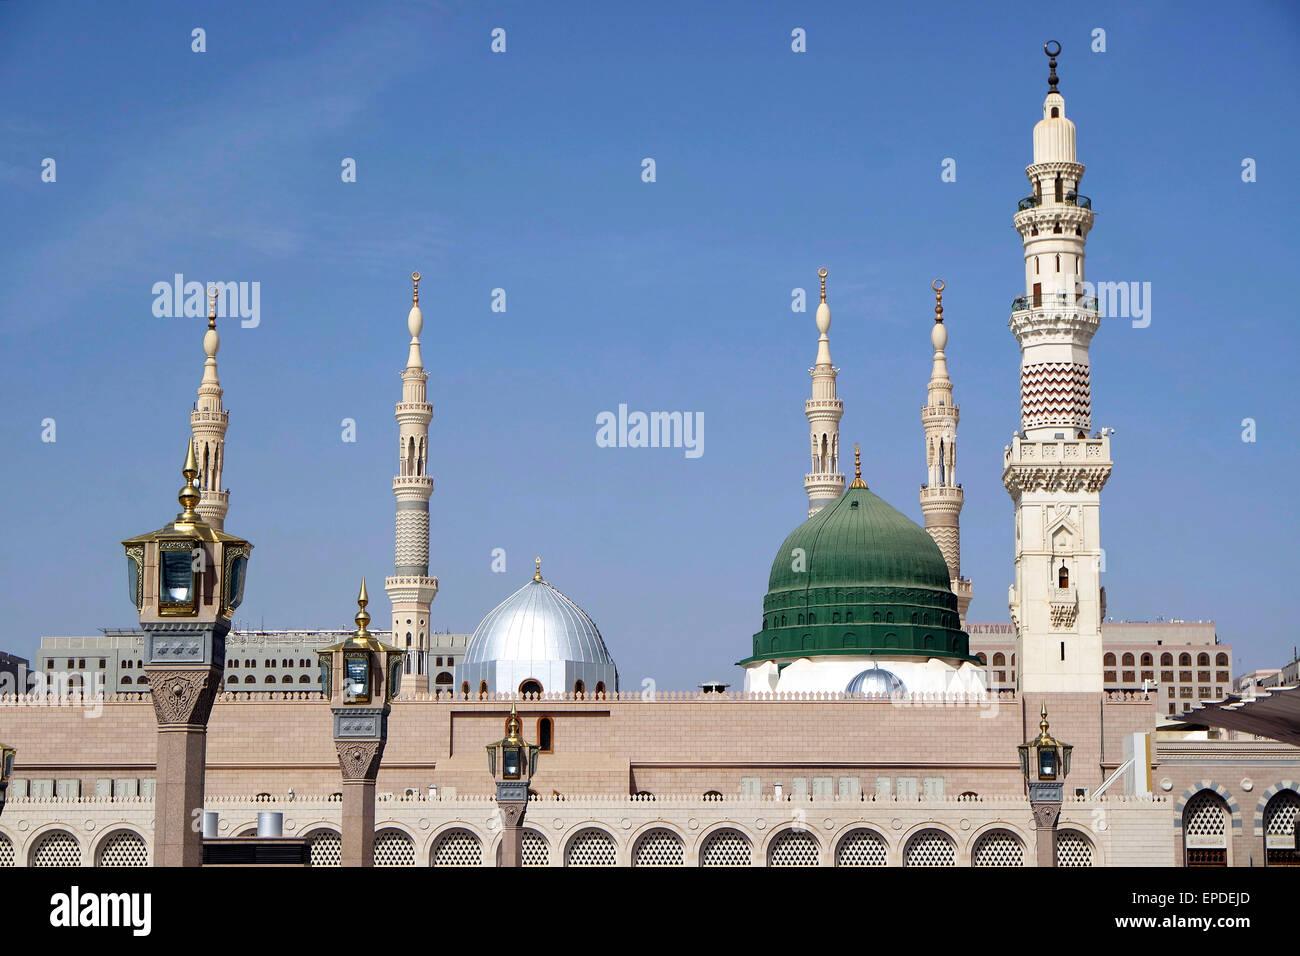 Medina City Mosque | www.imgkid.com - The Image Kid Has It!